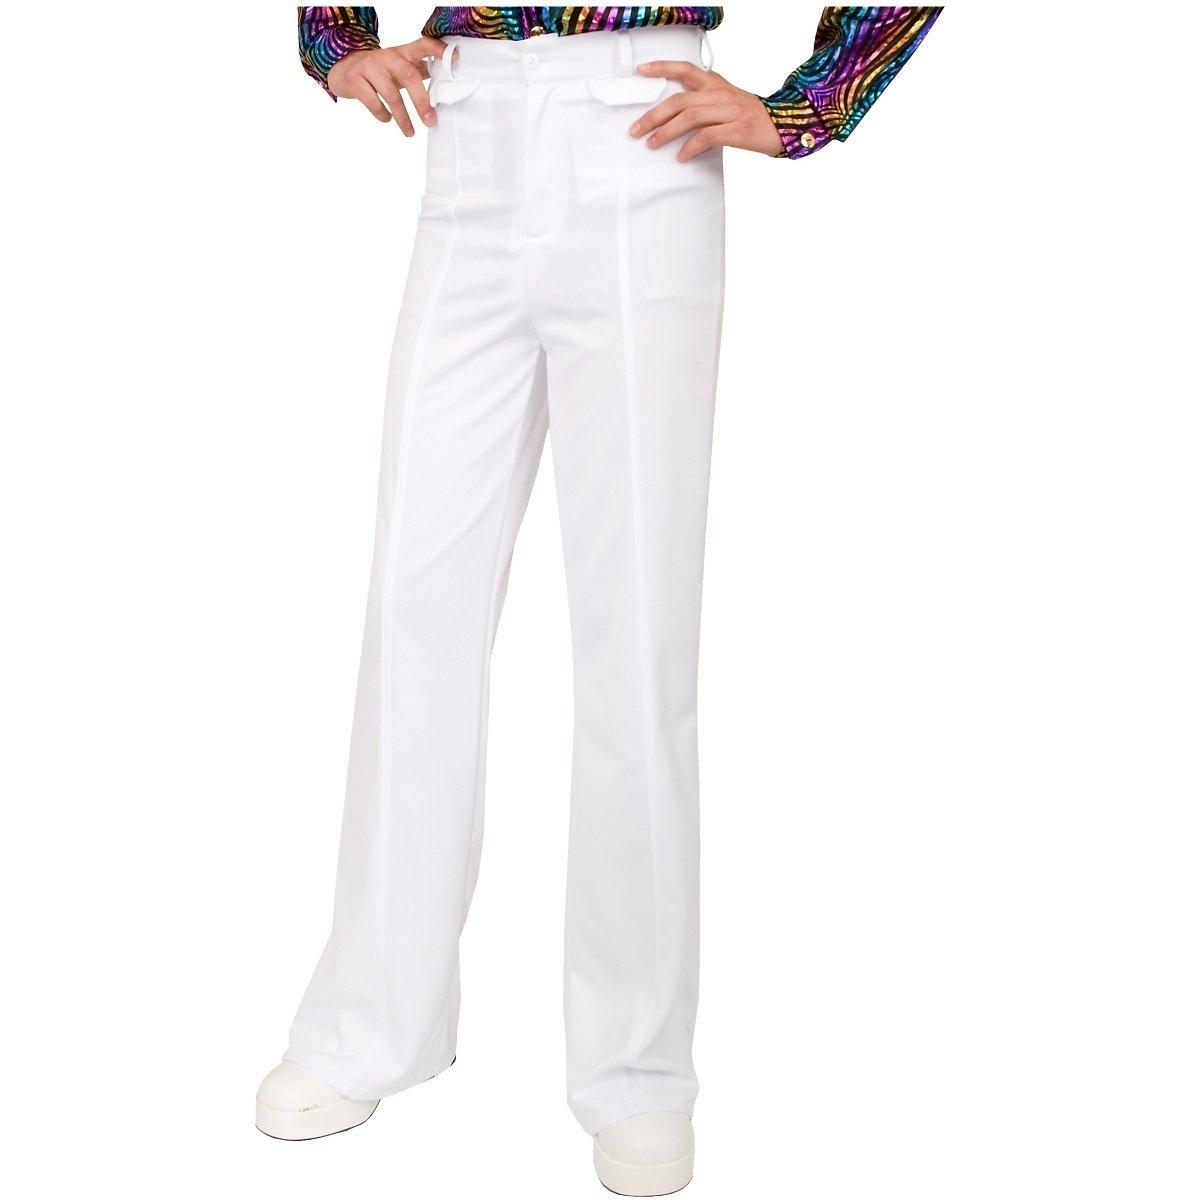 Charades Men's Disco Pant, White, 36